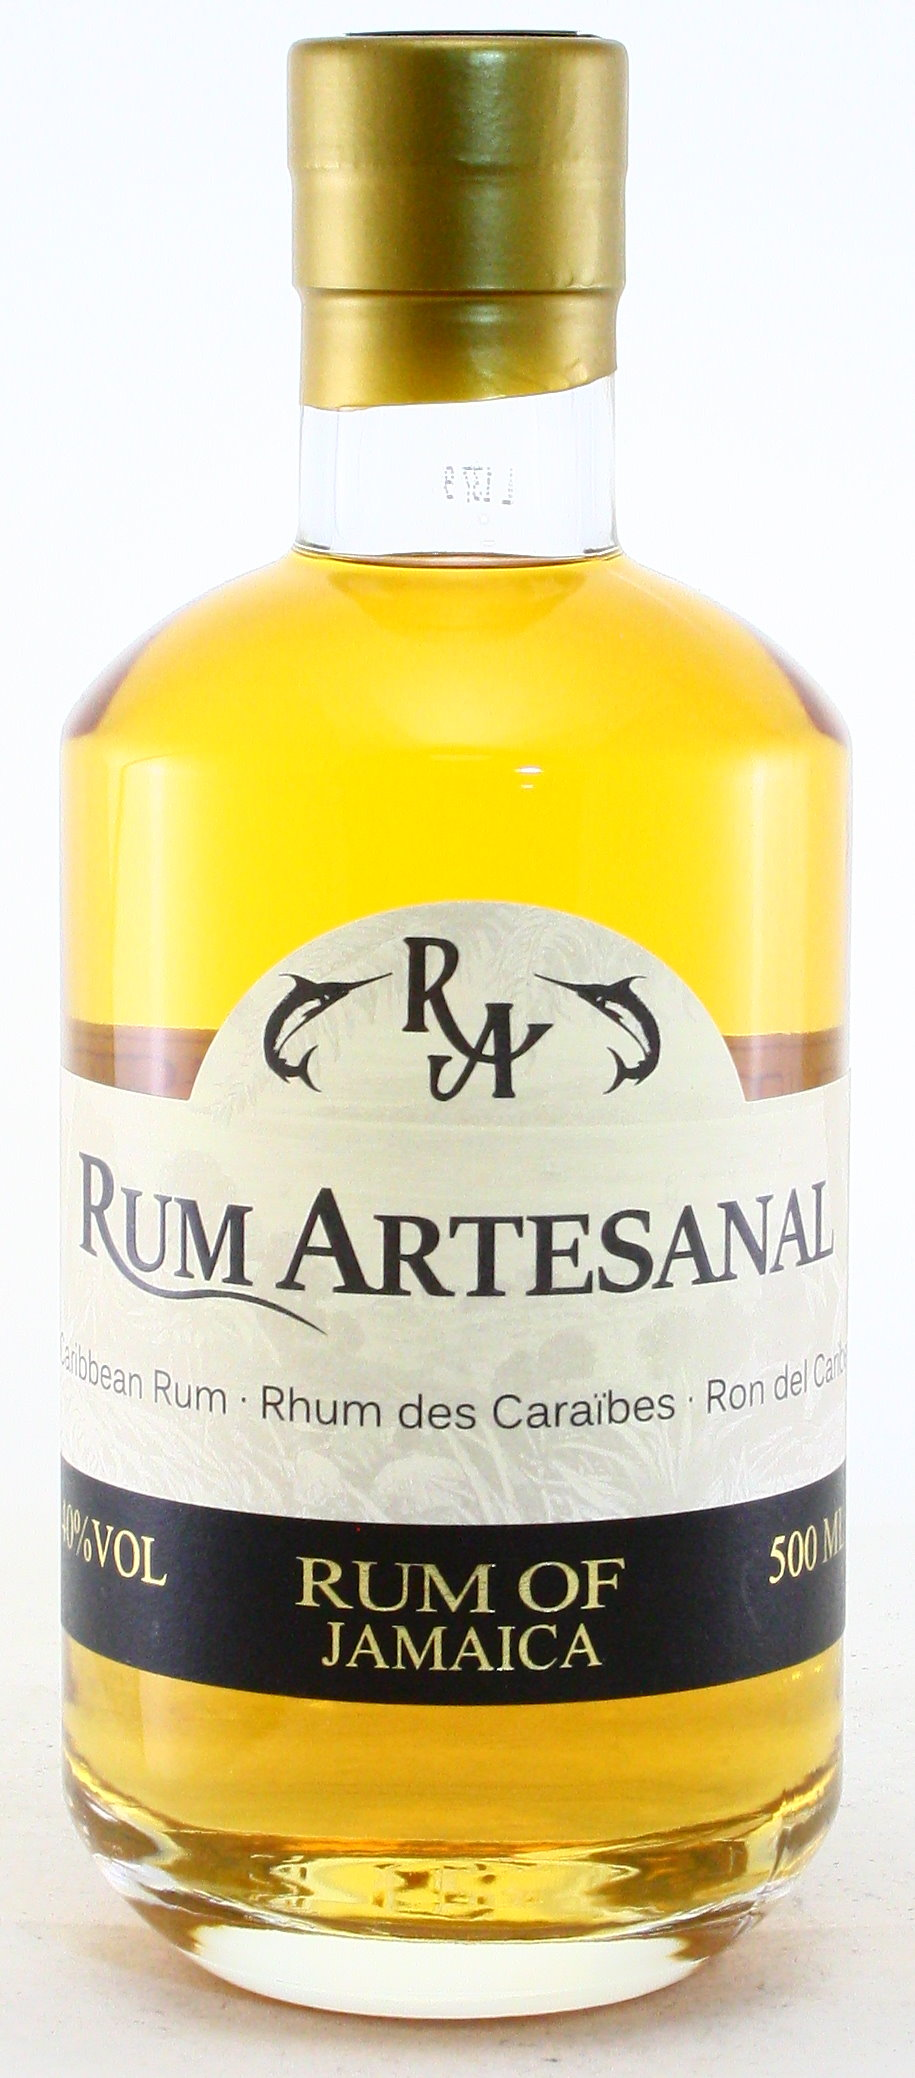 500 ml Rum of Jamaica, Rum Artesanal Jamaika